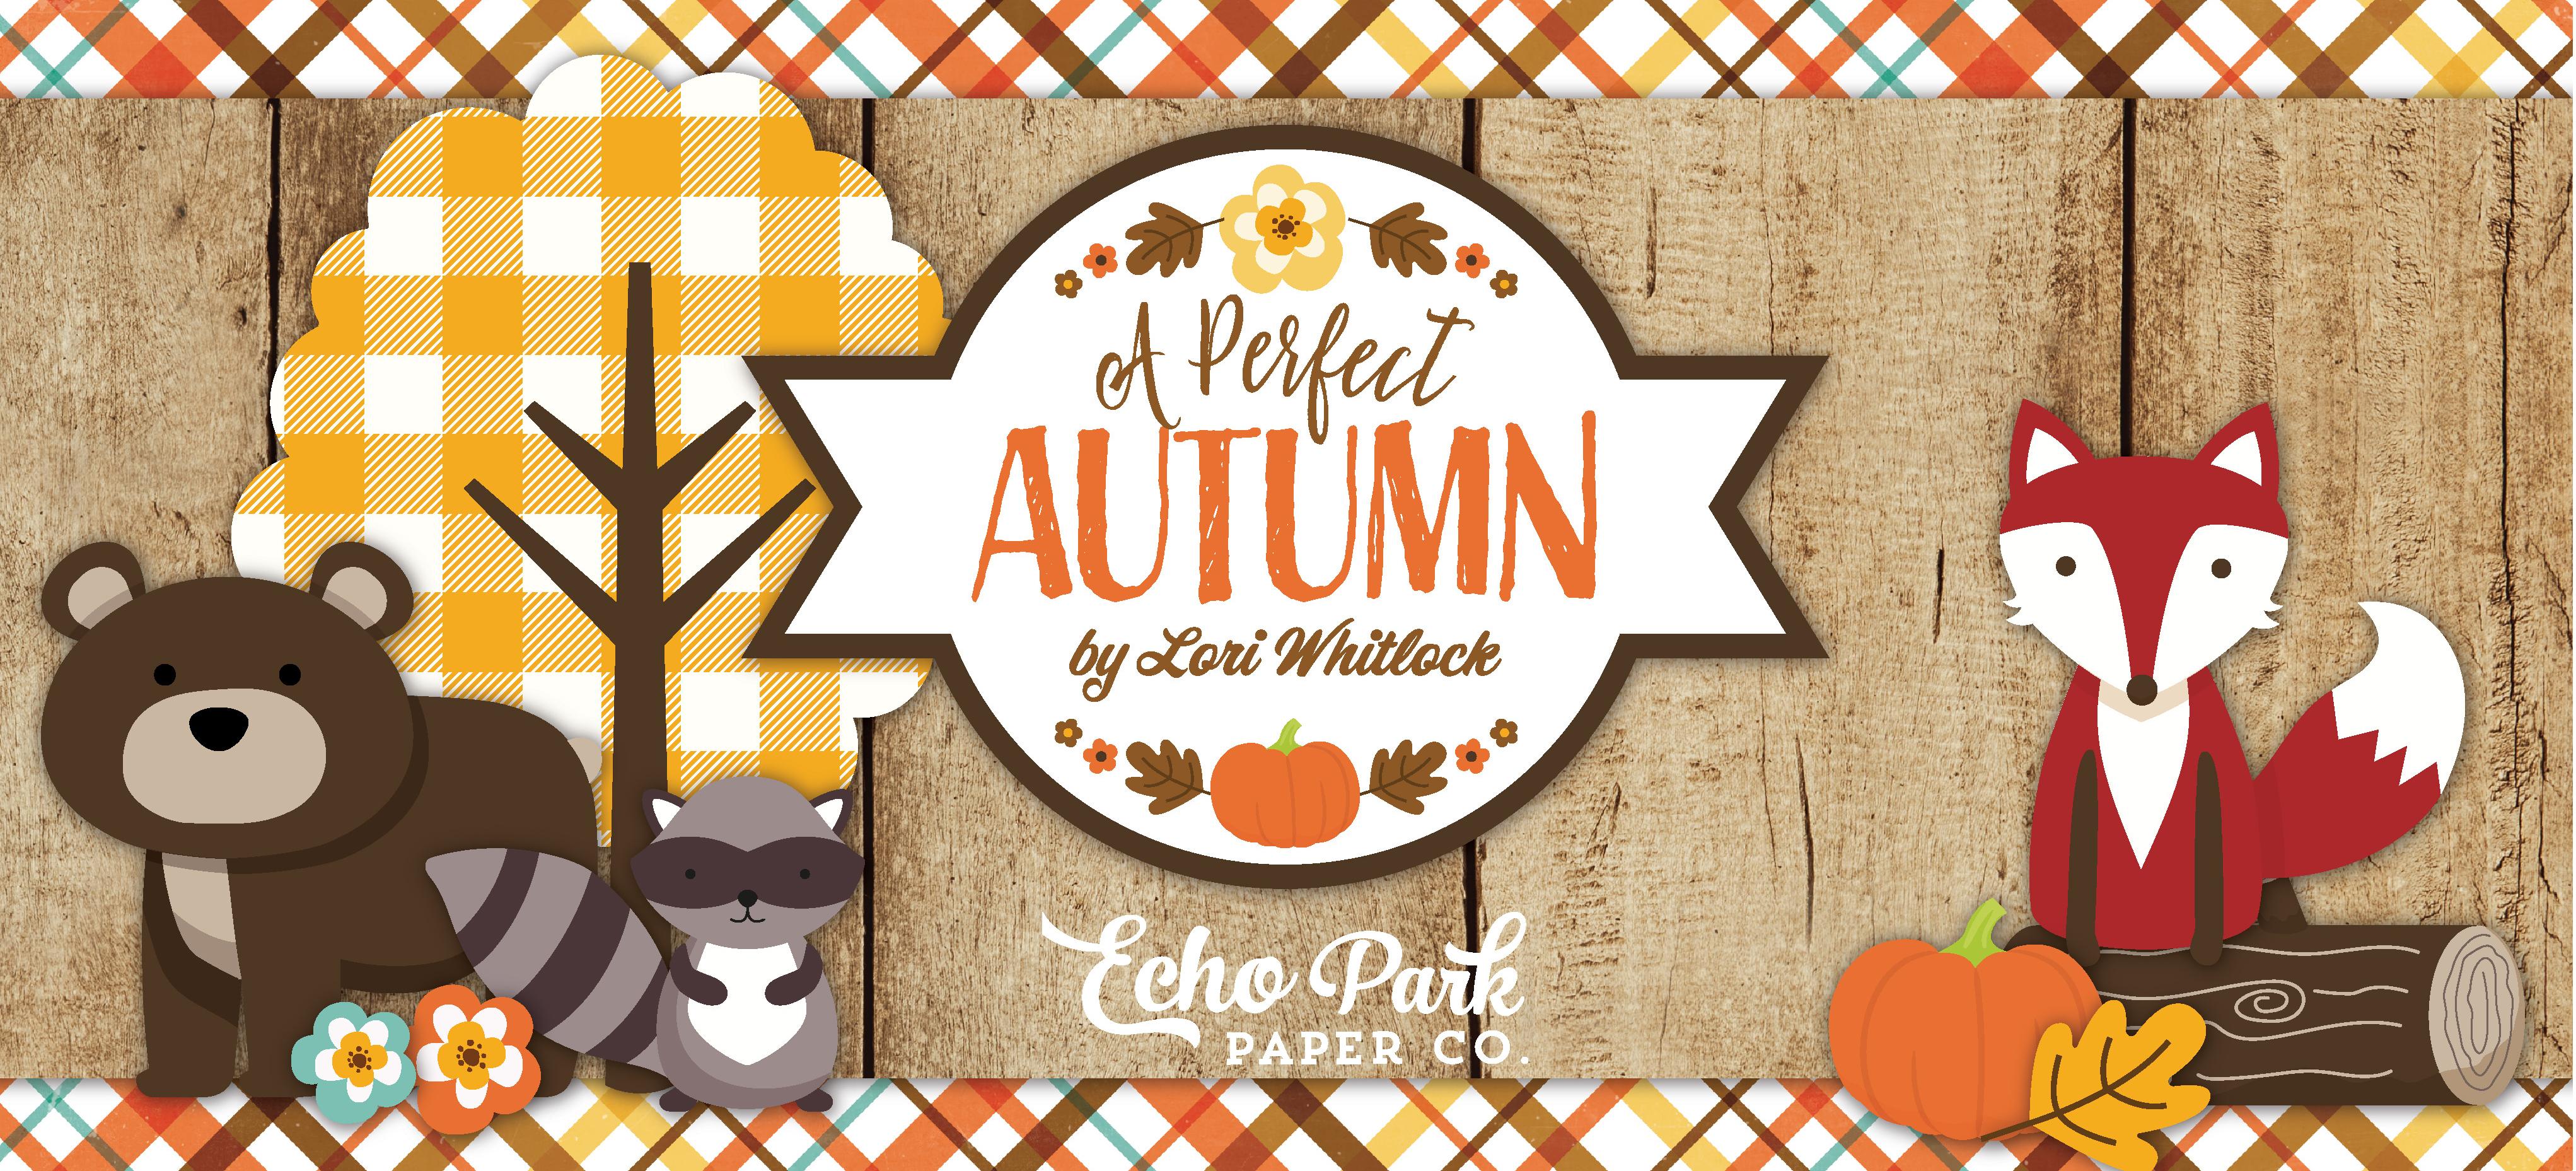 a-perfect-autumn-banner.jpg